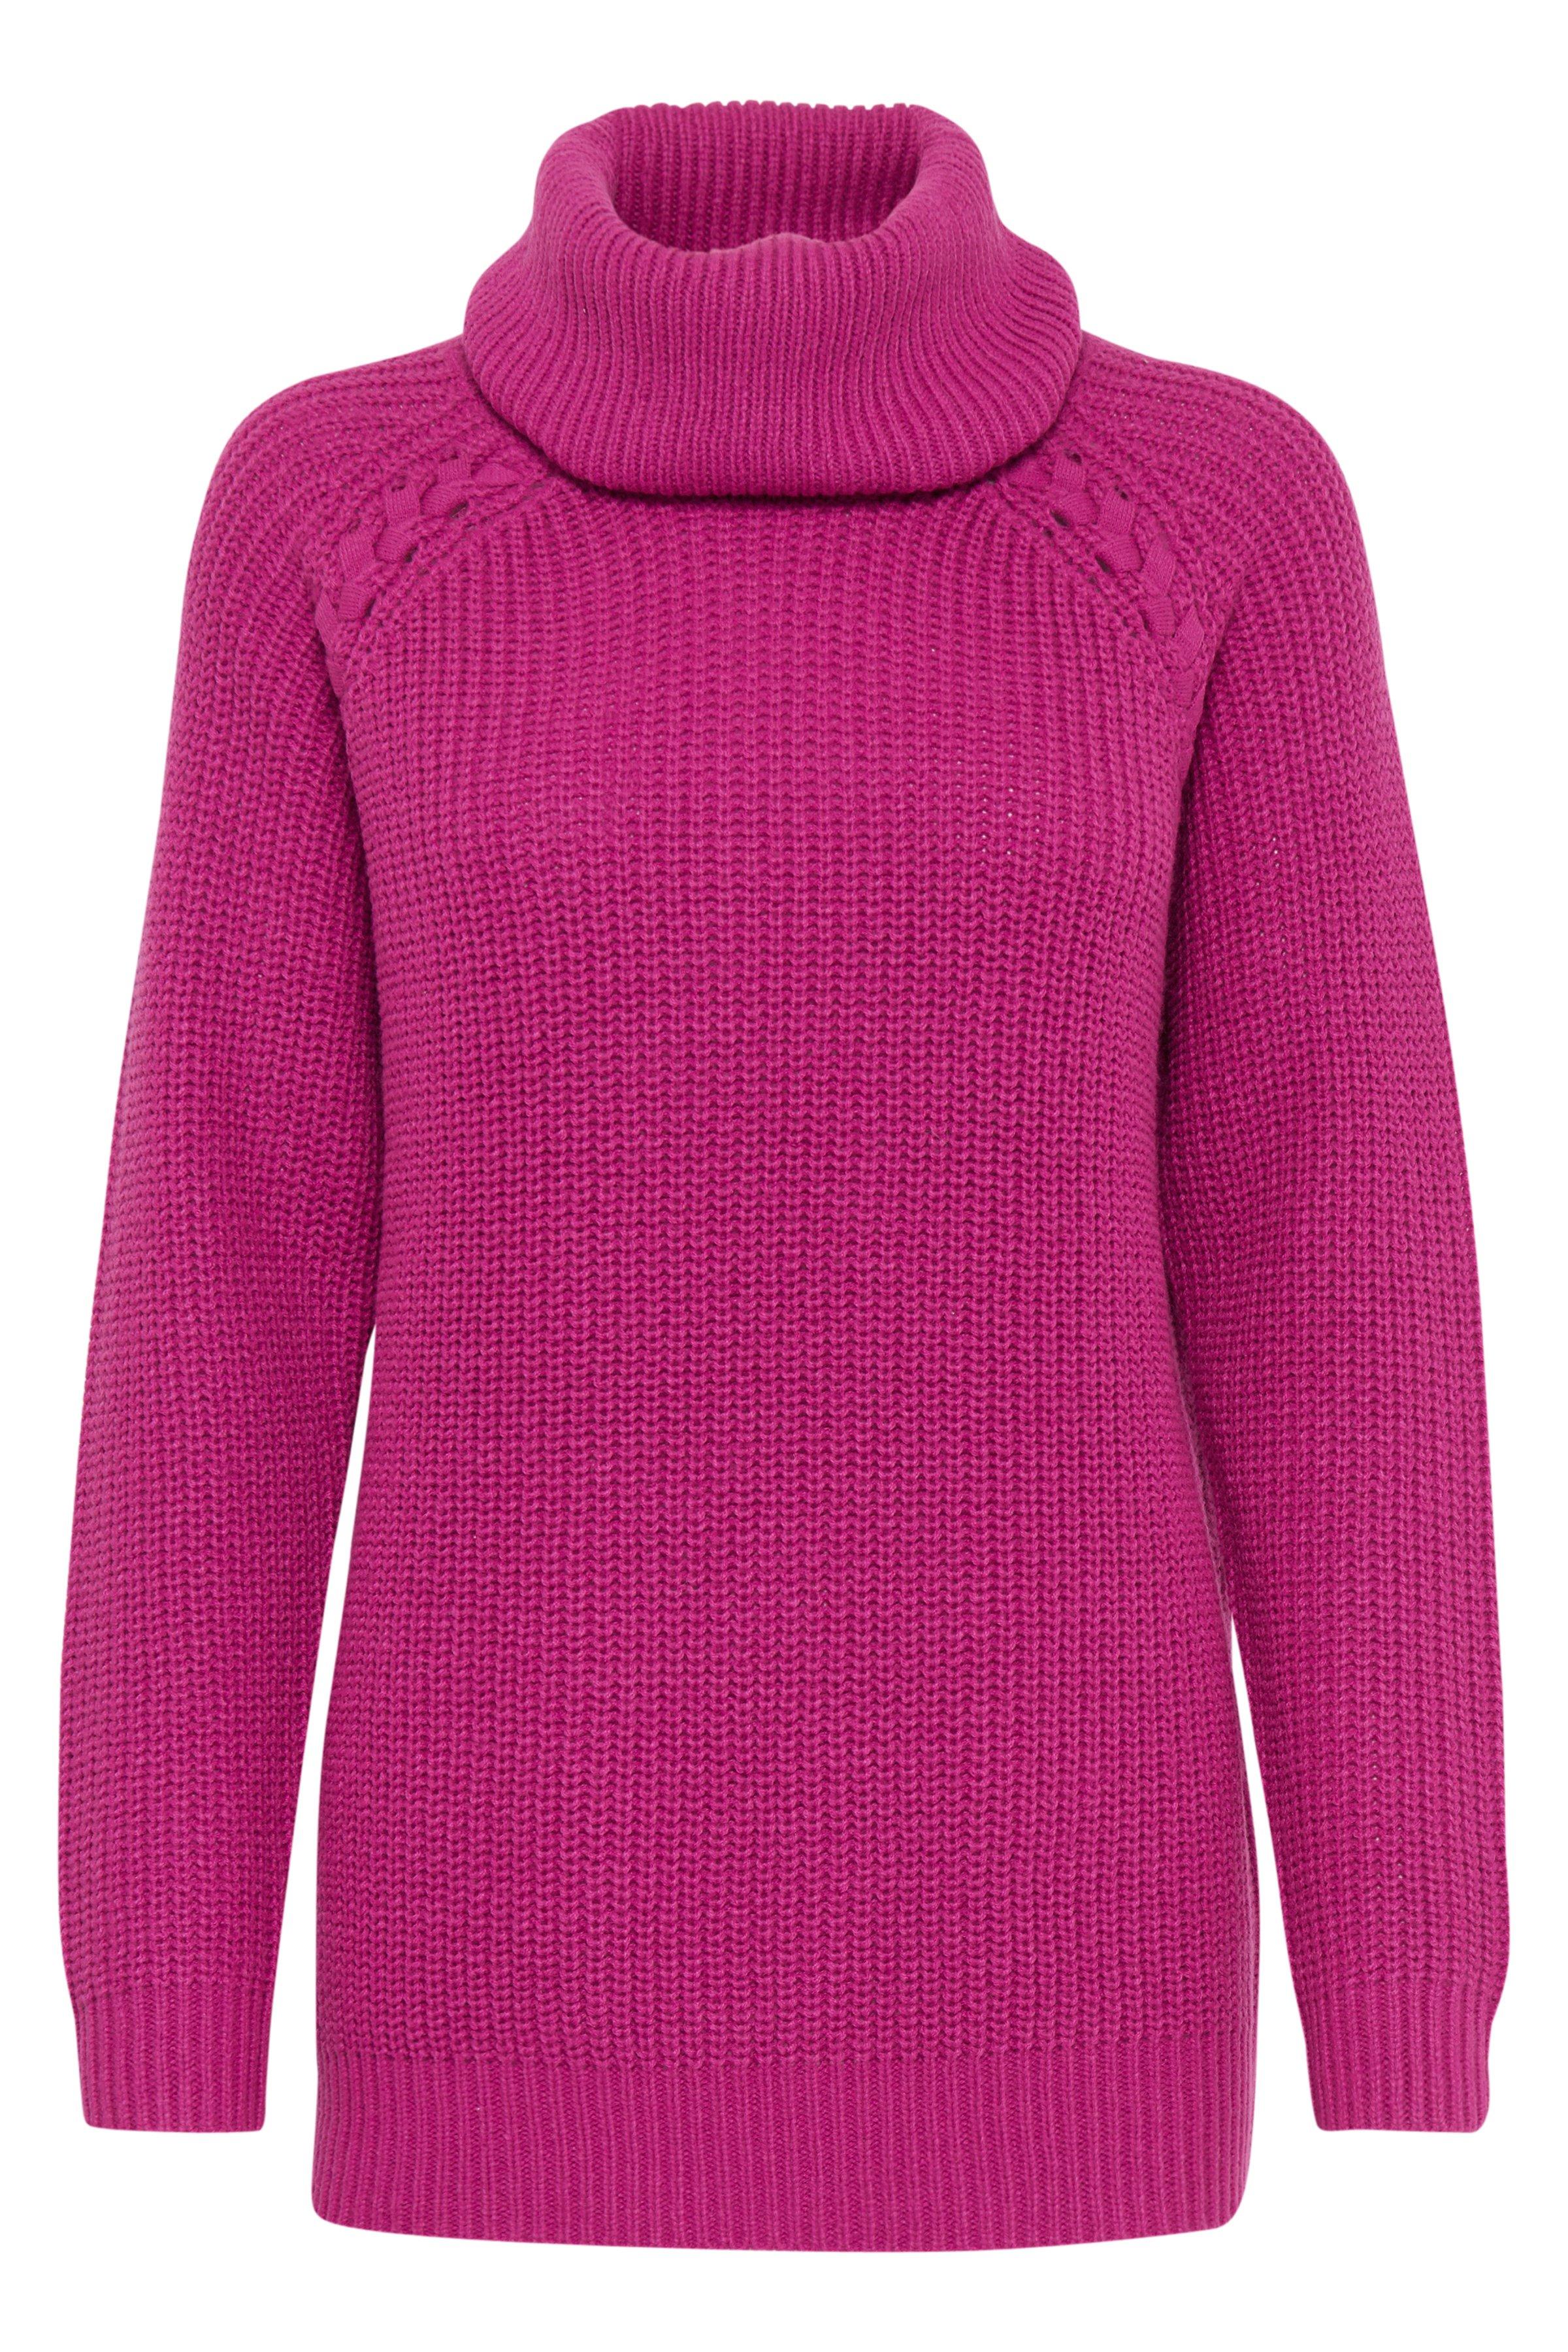 b.young Dame Gebreide pullover - Donker cerise